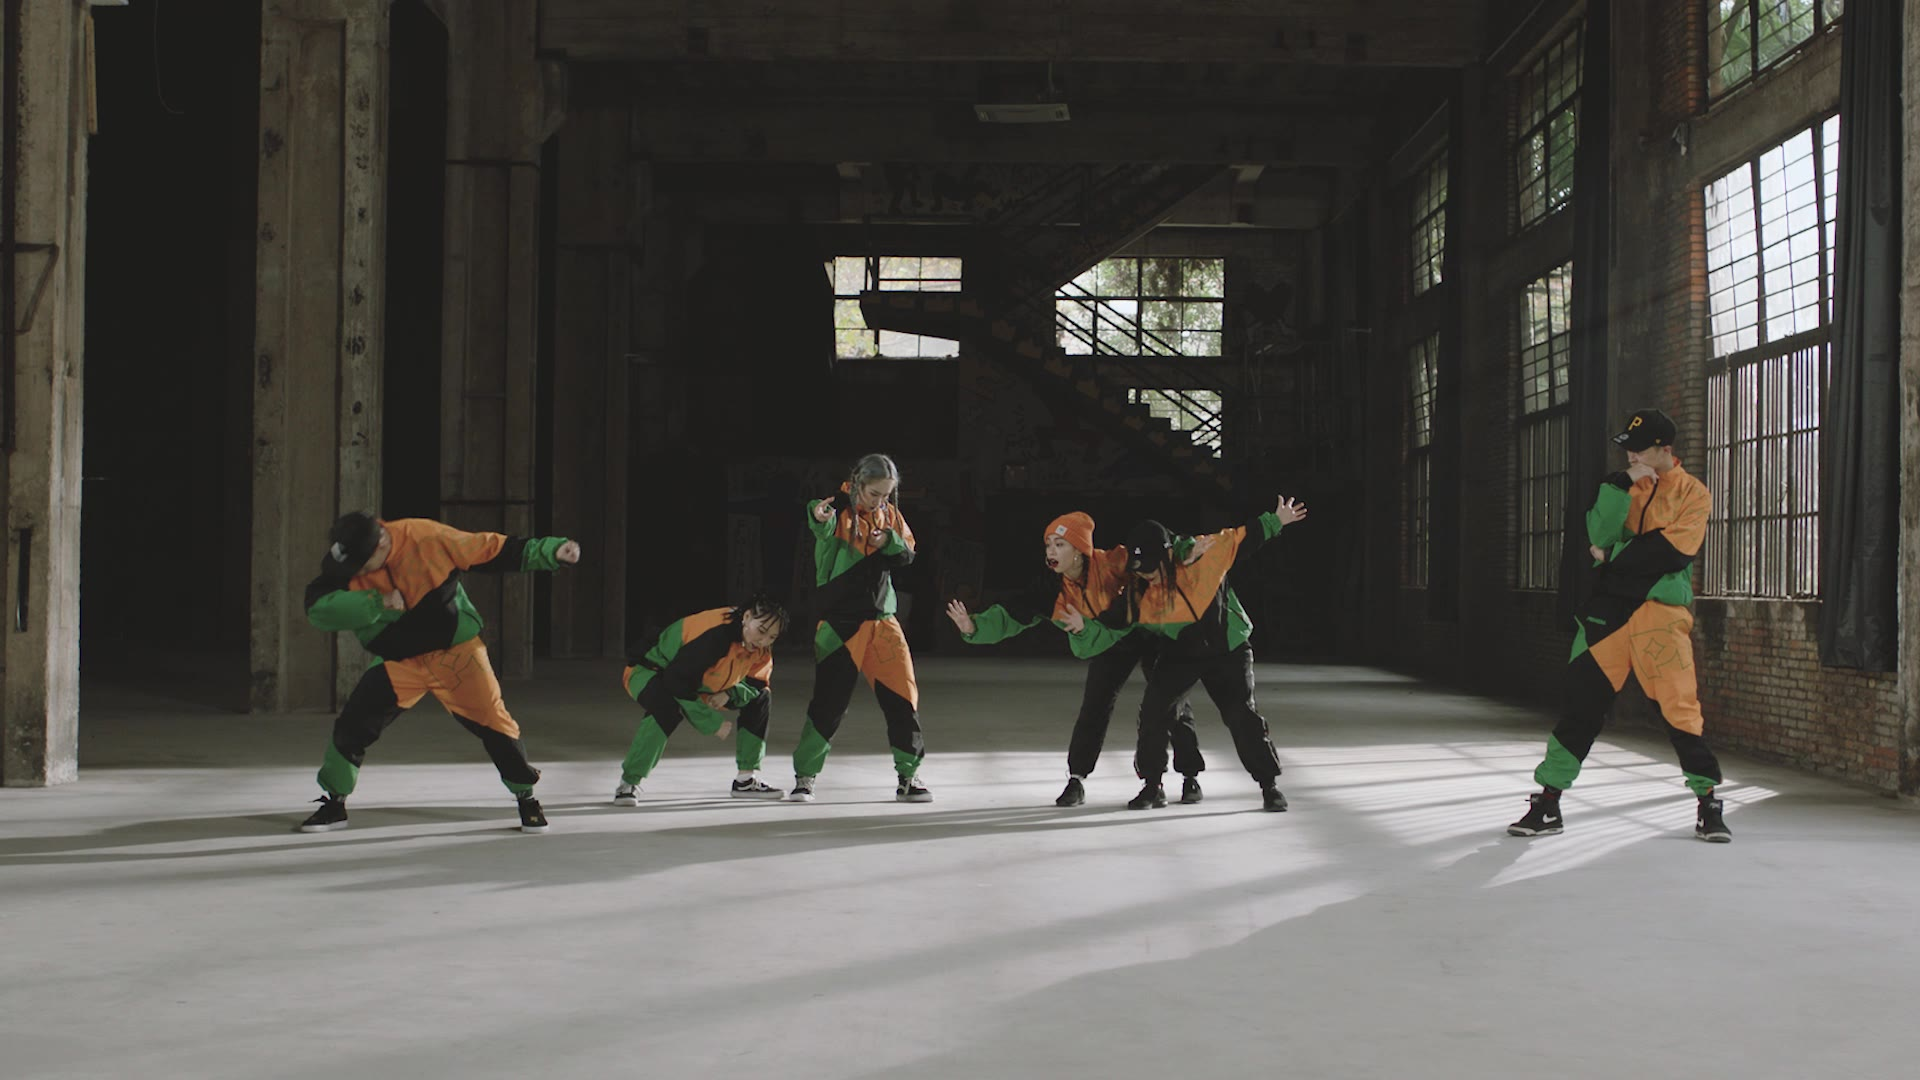 CASTER舞蹈作品︱BLACK FEAR - Dumbo - Lil Live